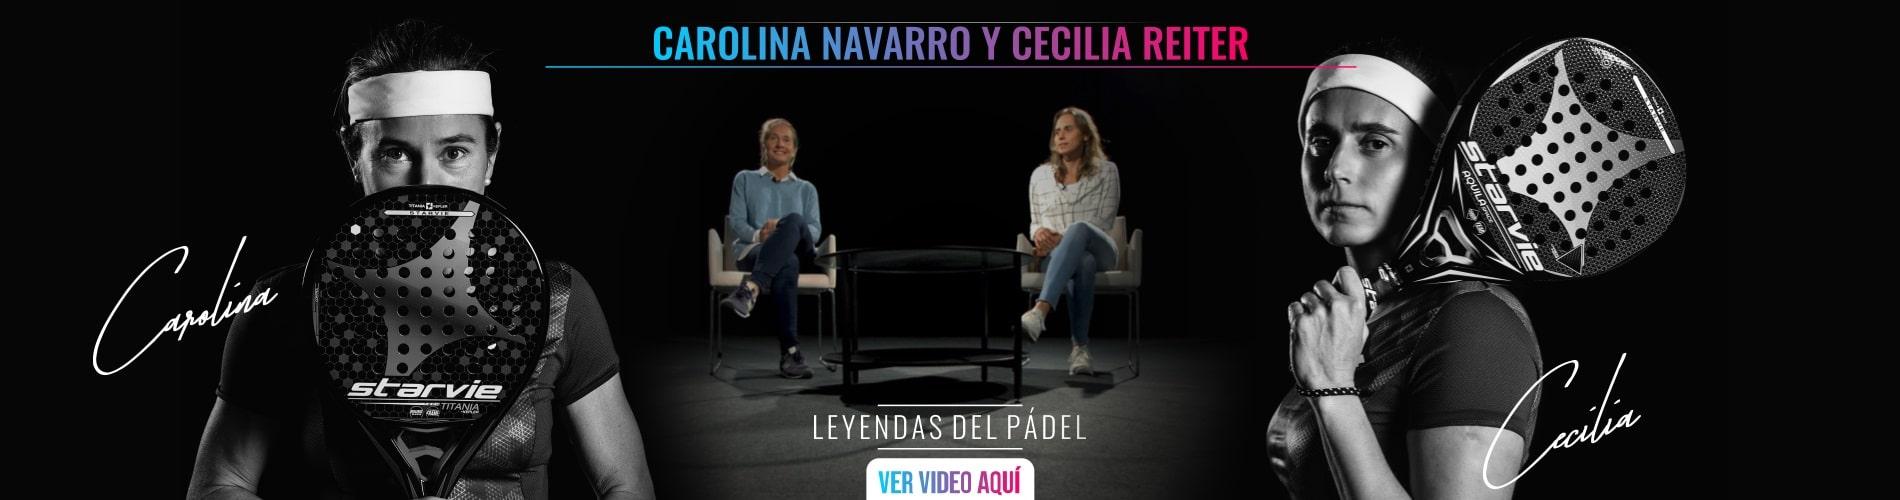 Documental padel Carolina Navarro y Cecilia Reiter